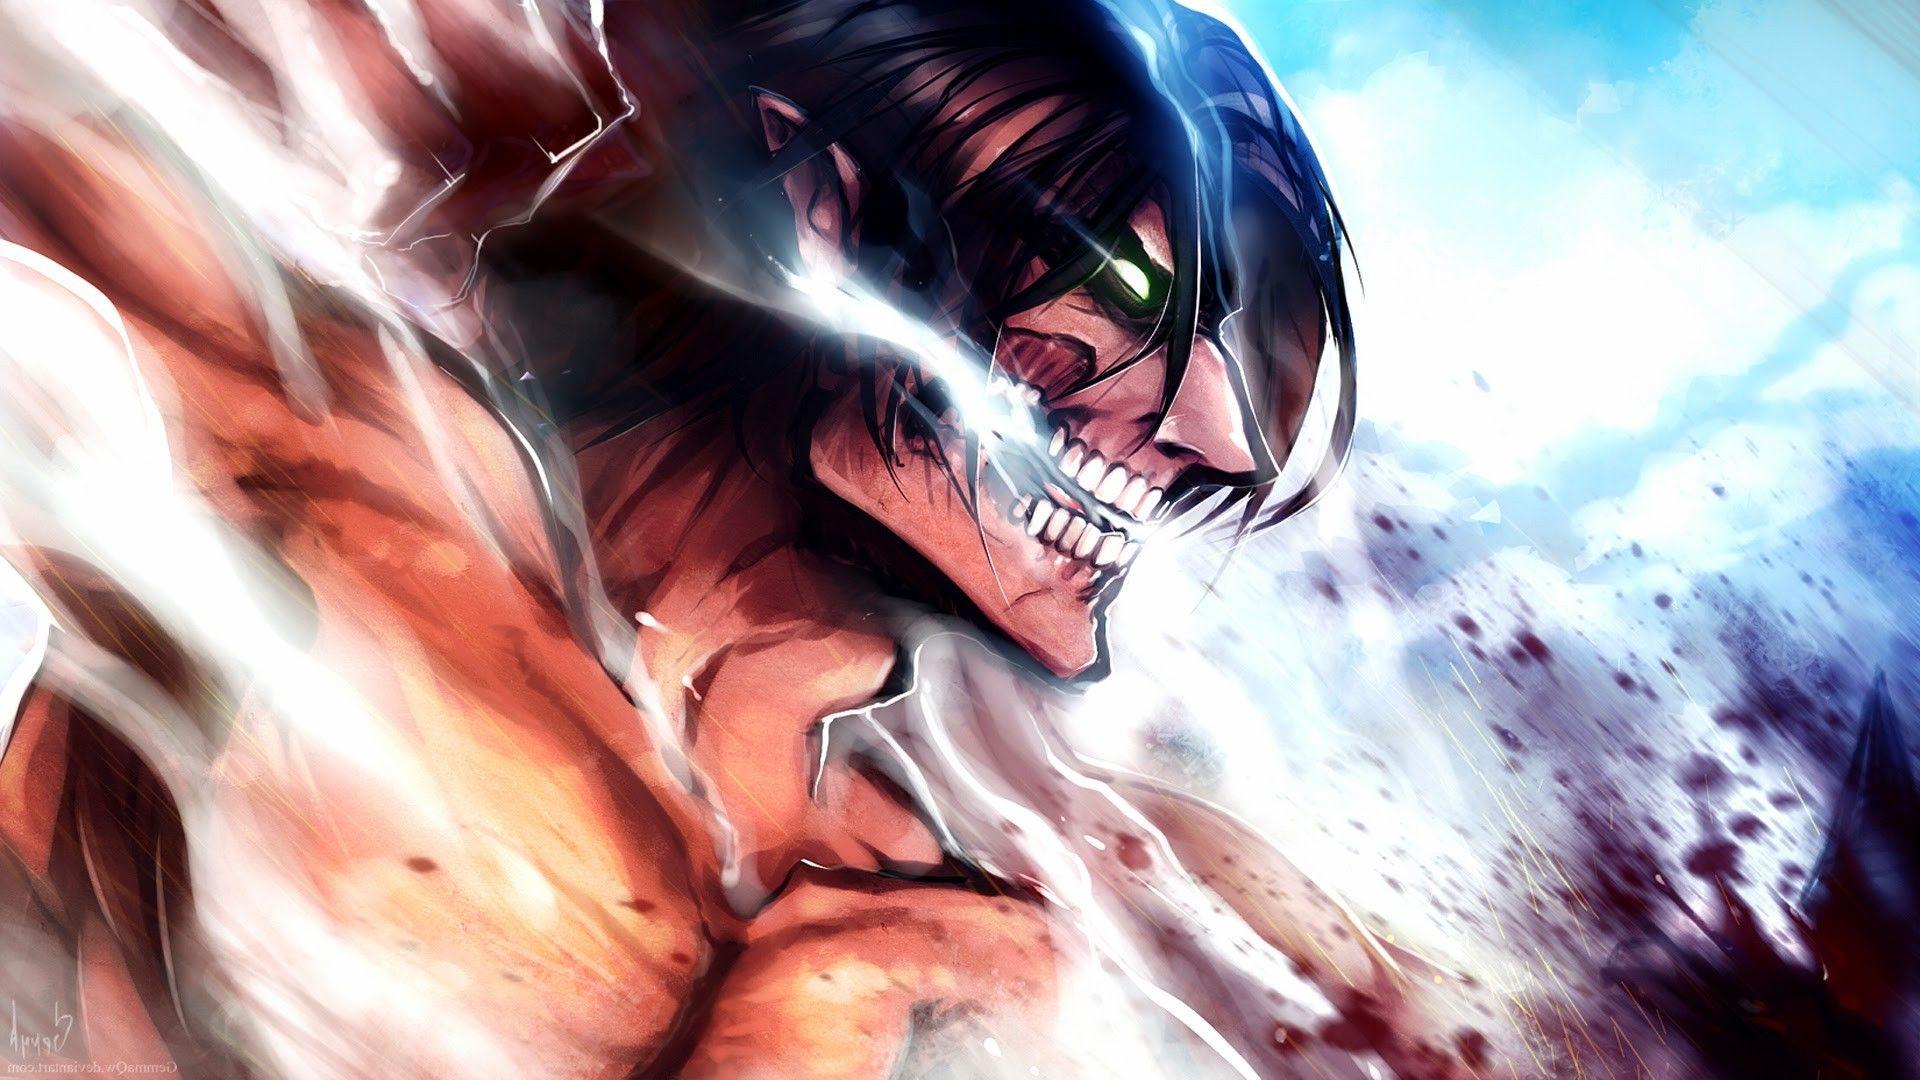 Shingeki No Kyojin Imagenes Hd Dowload Anime Wallpaper Hd